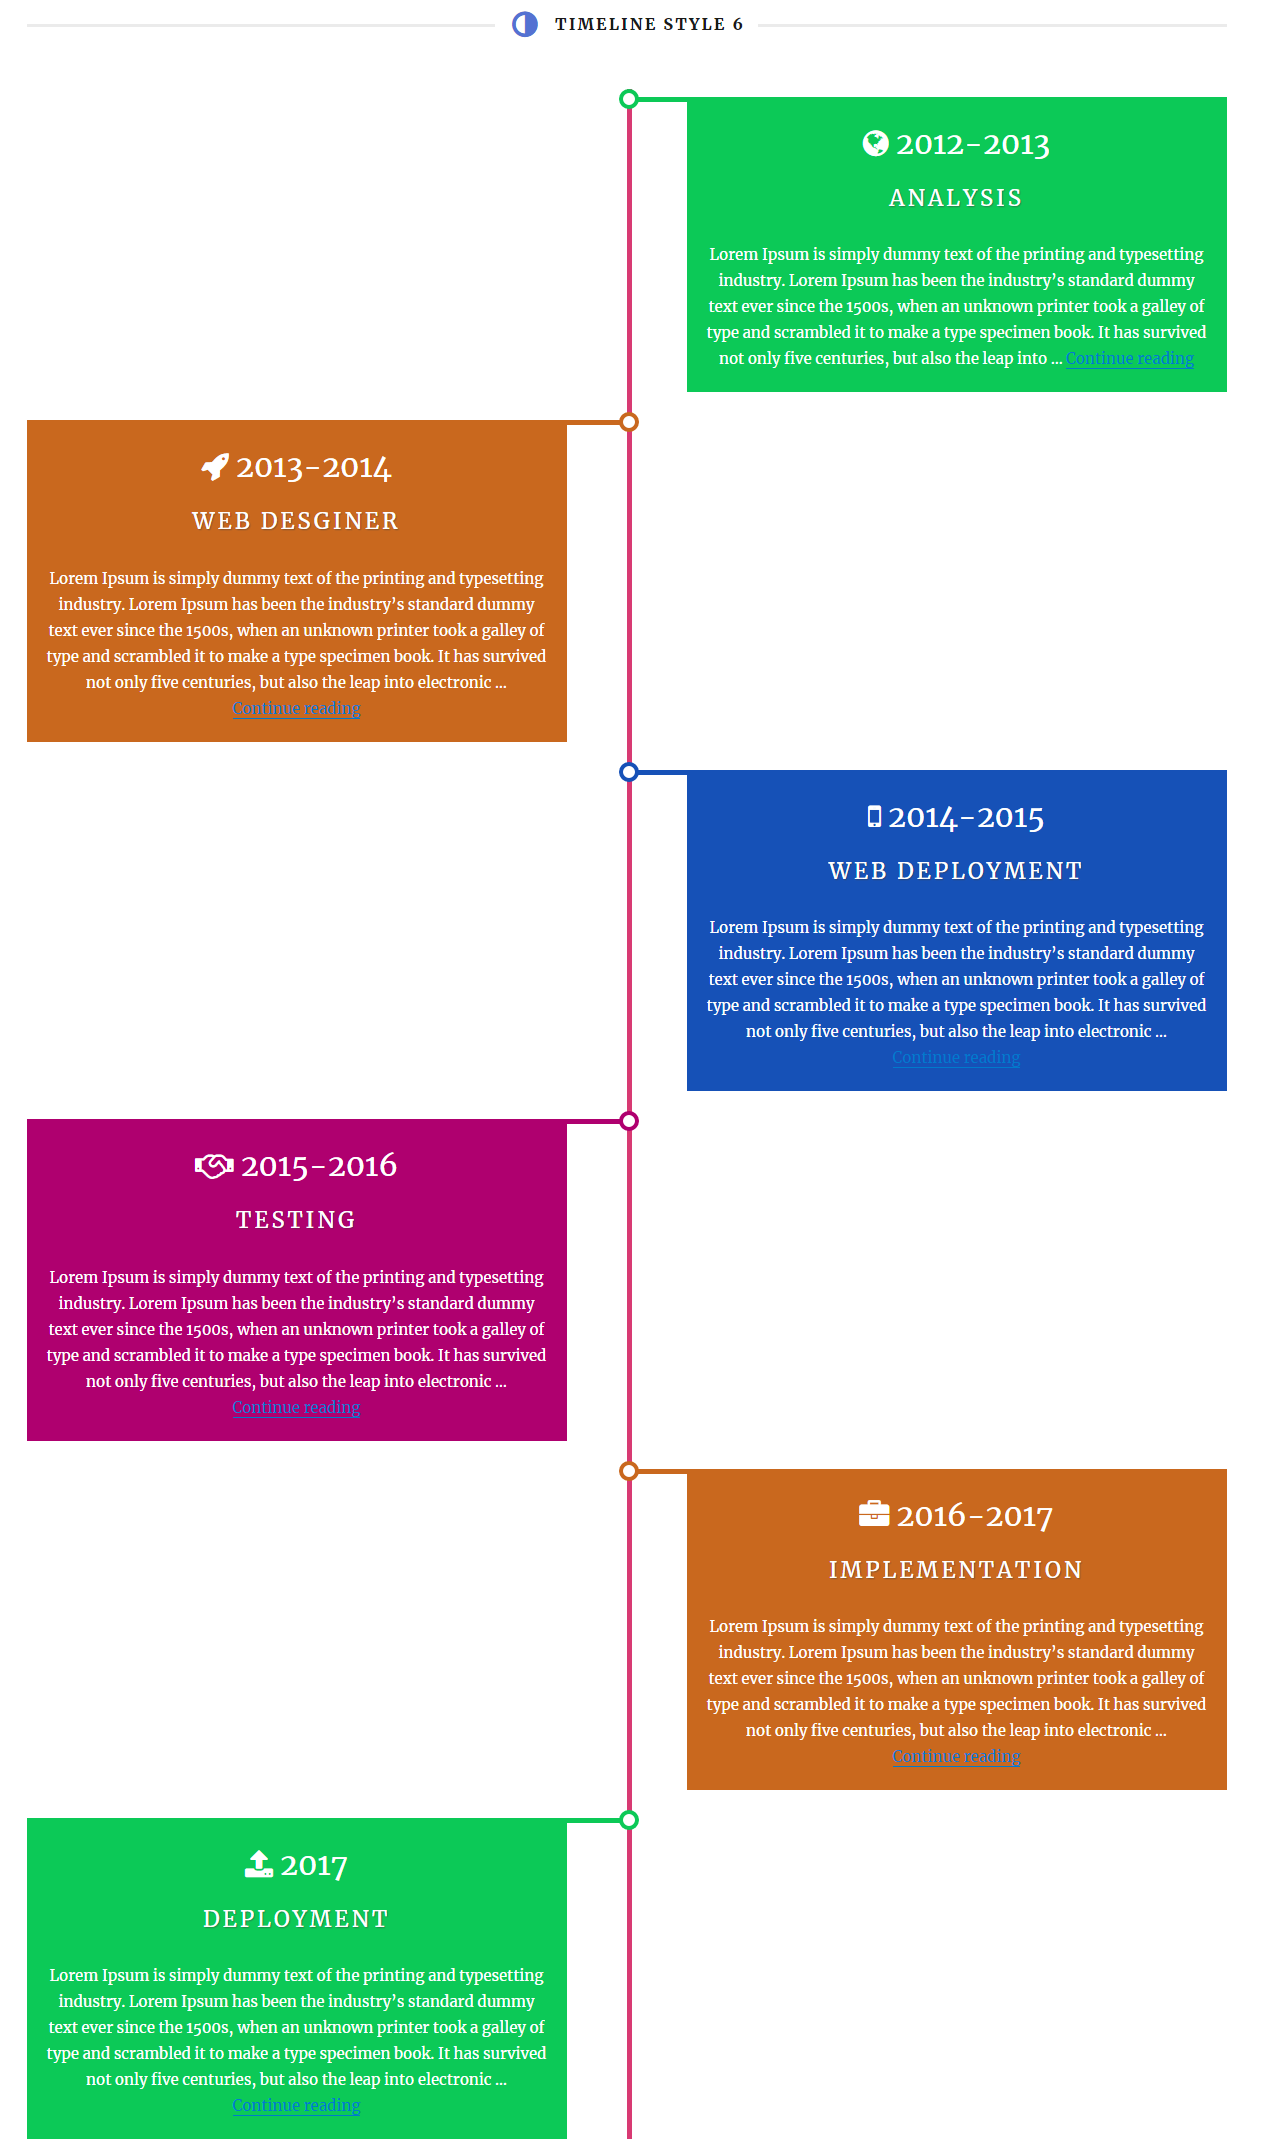 visual7 - Visual Composer Timeline Add on